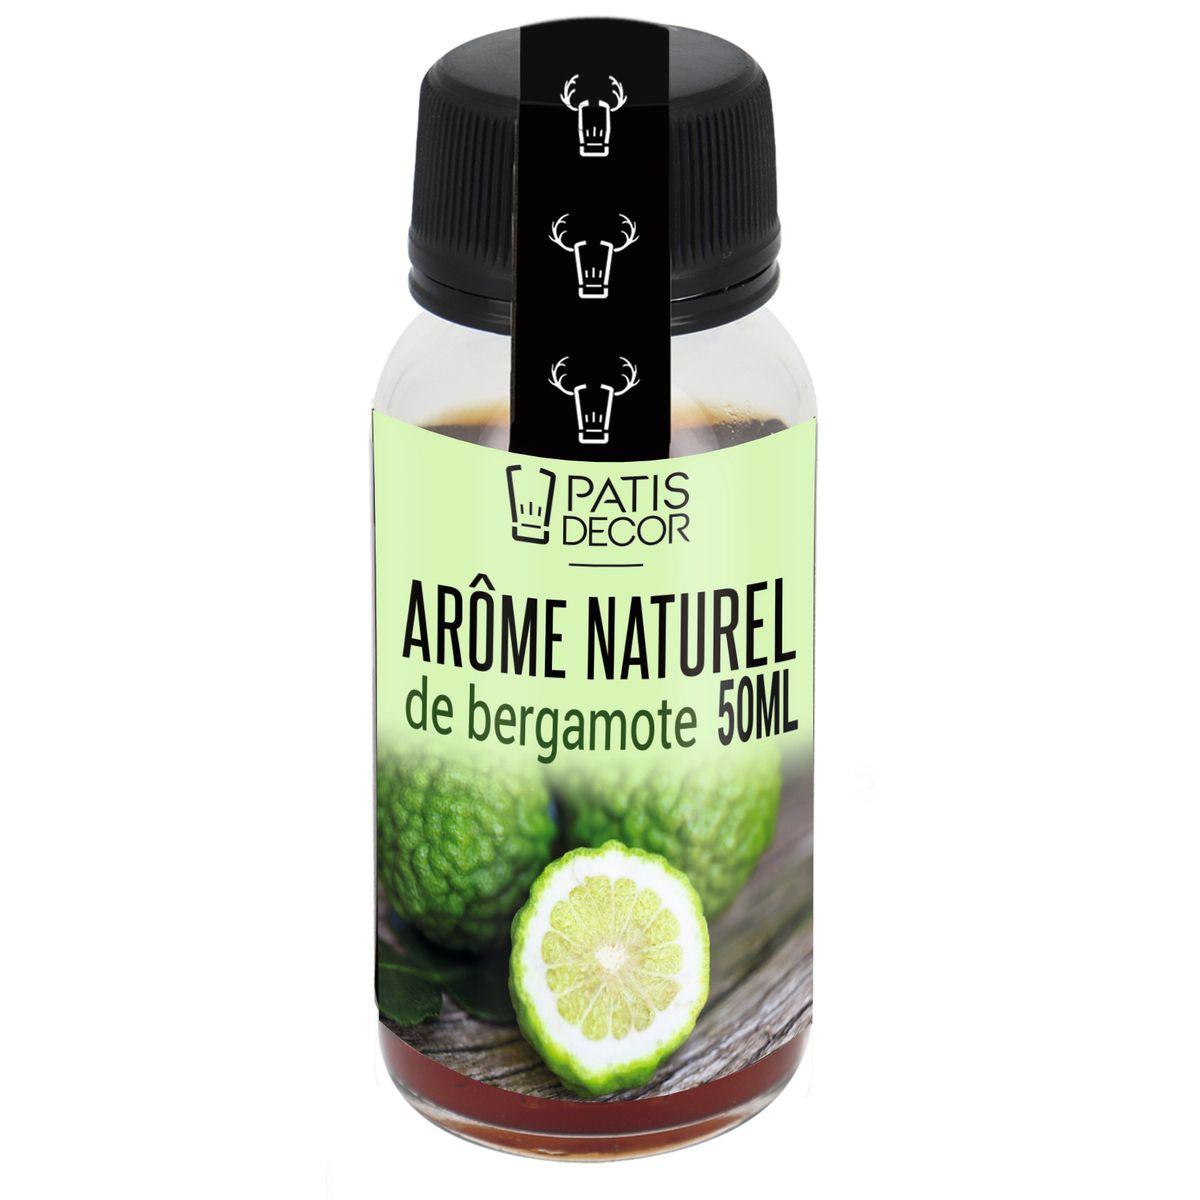 Arôme alimentaire naturel bergamote 50ml - Patisdecor